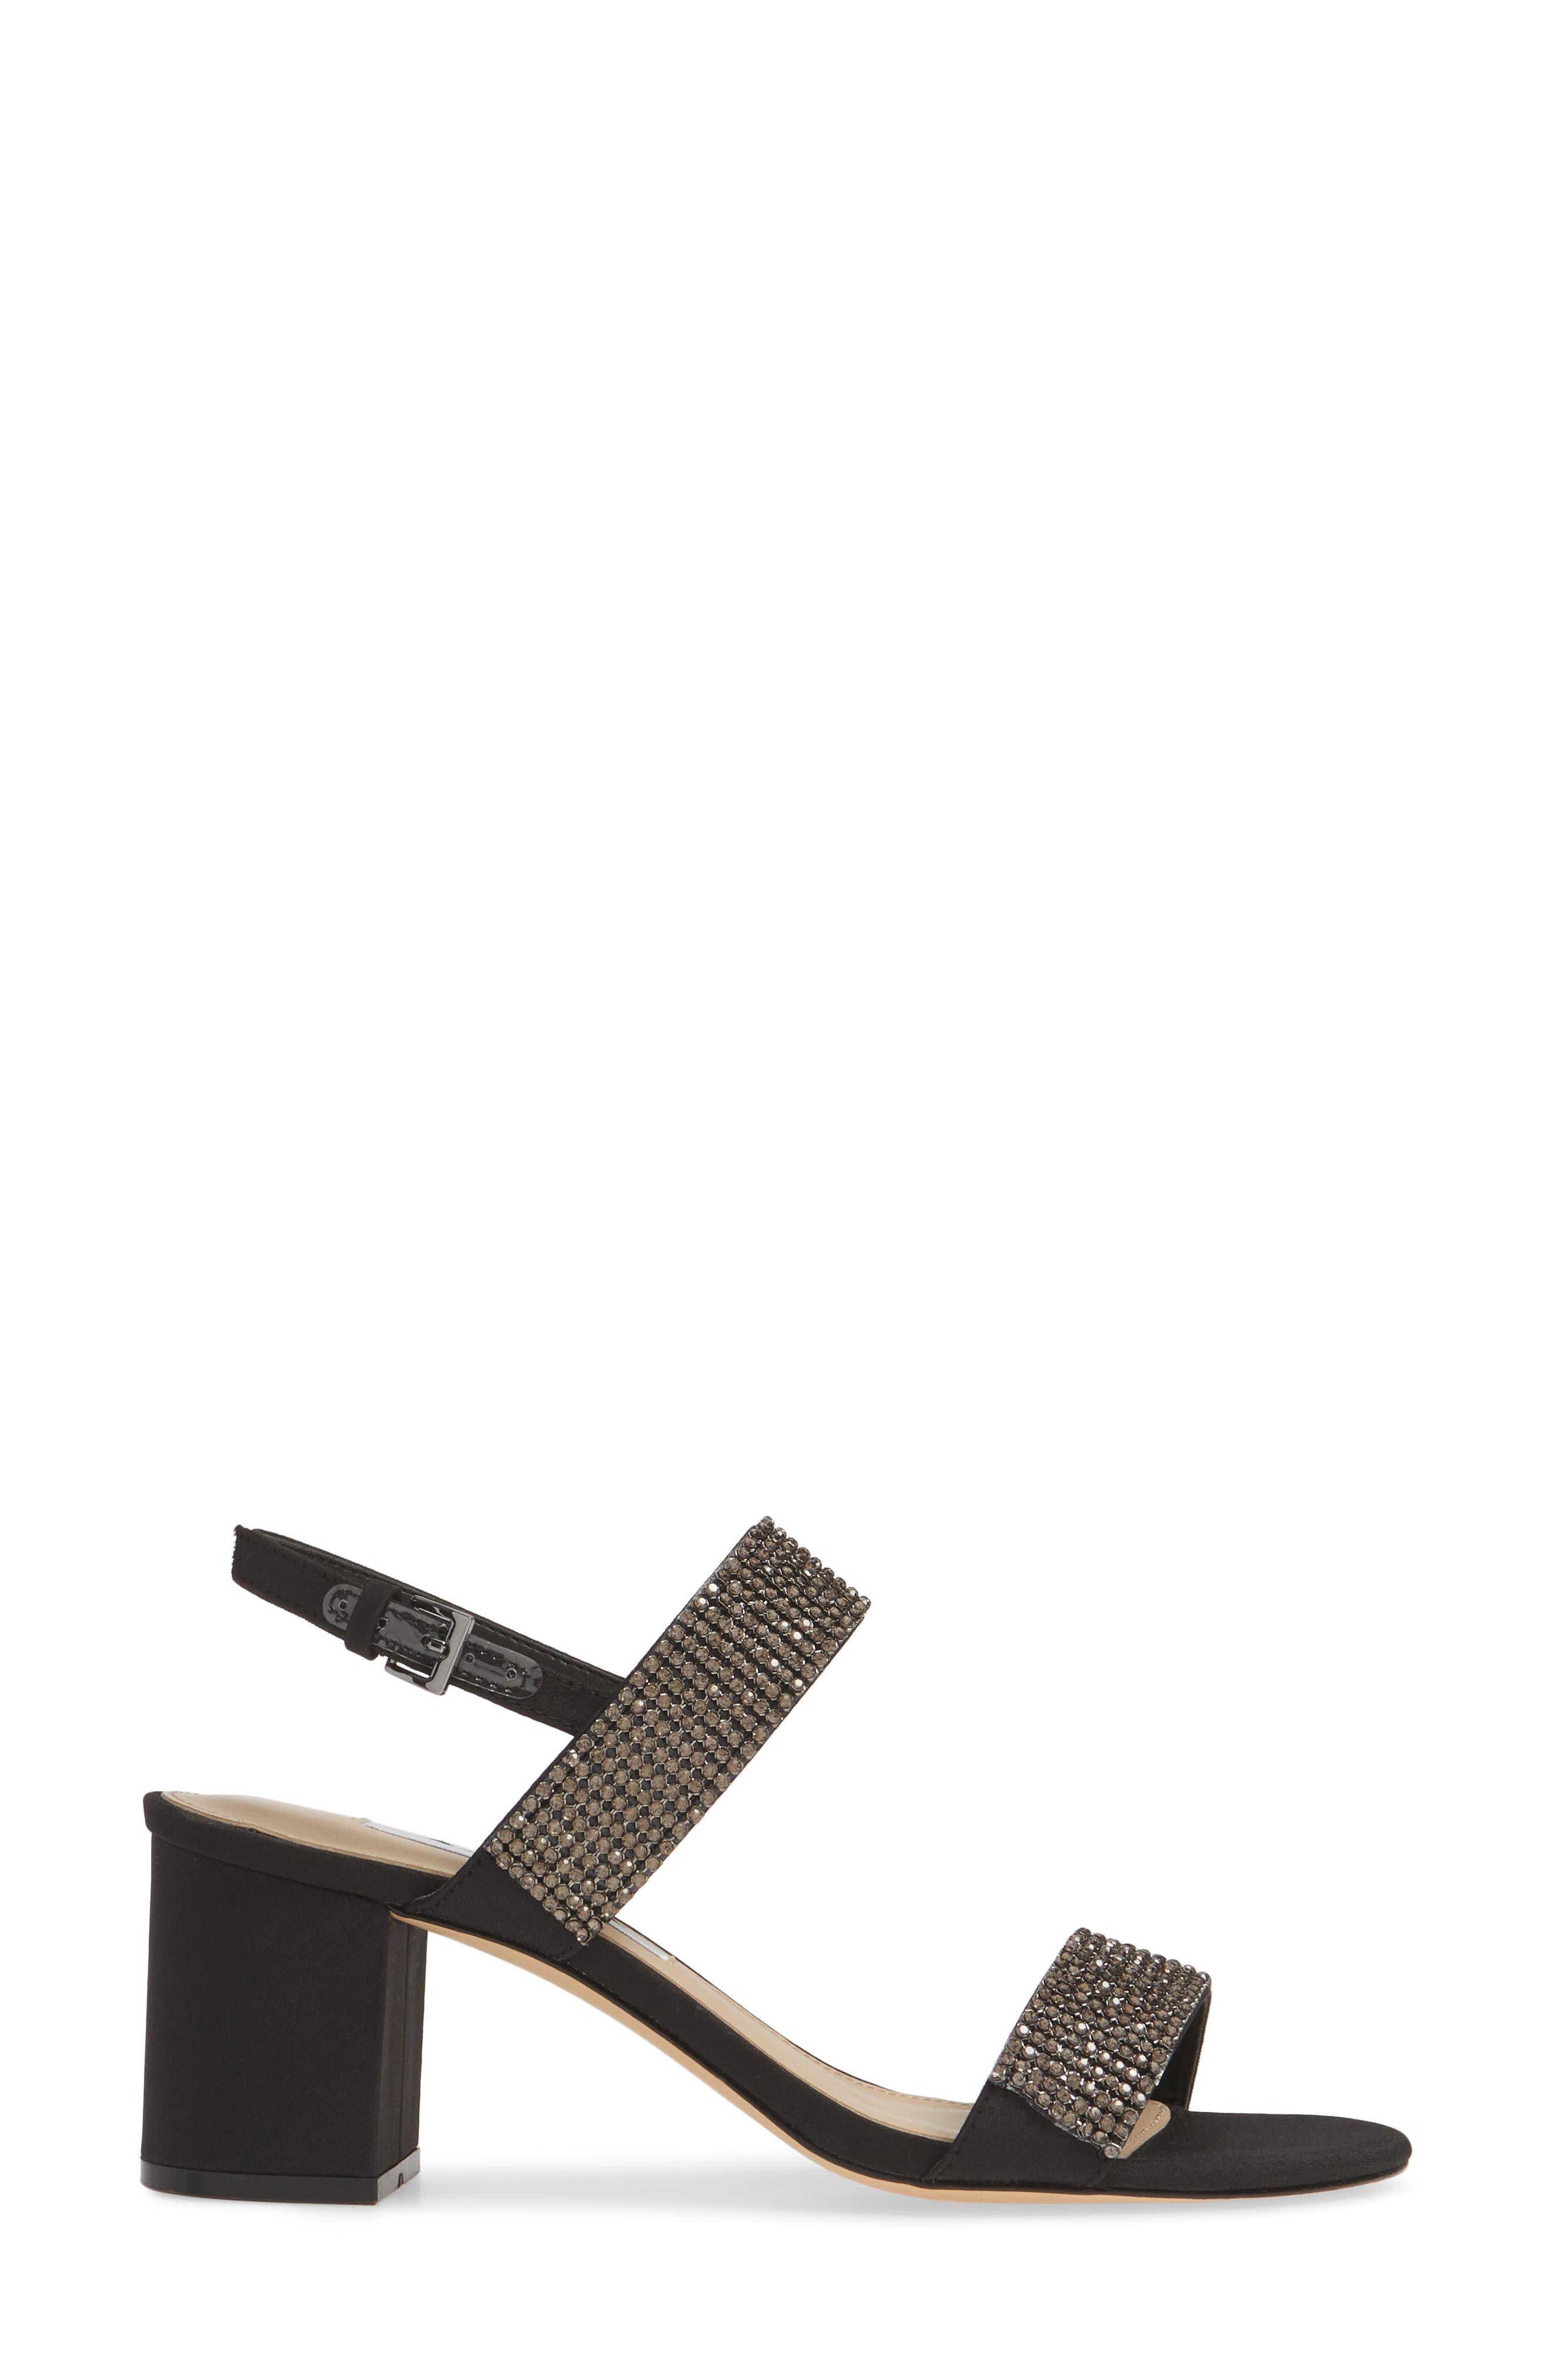 NINA, Naomi Crystal Embellished Sandal, Alternate thumbnail 3, color, BLACK FABRIC